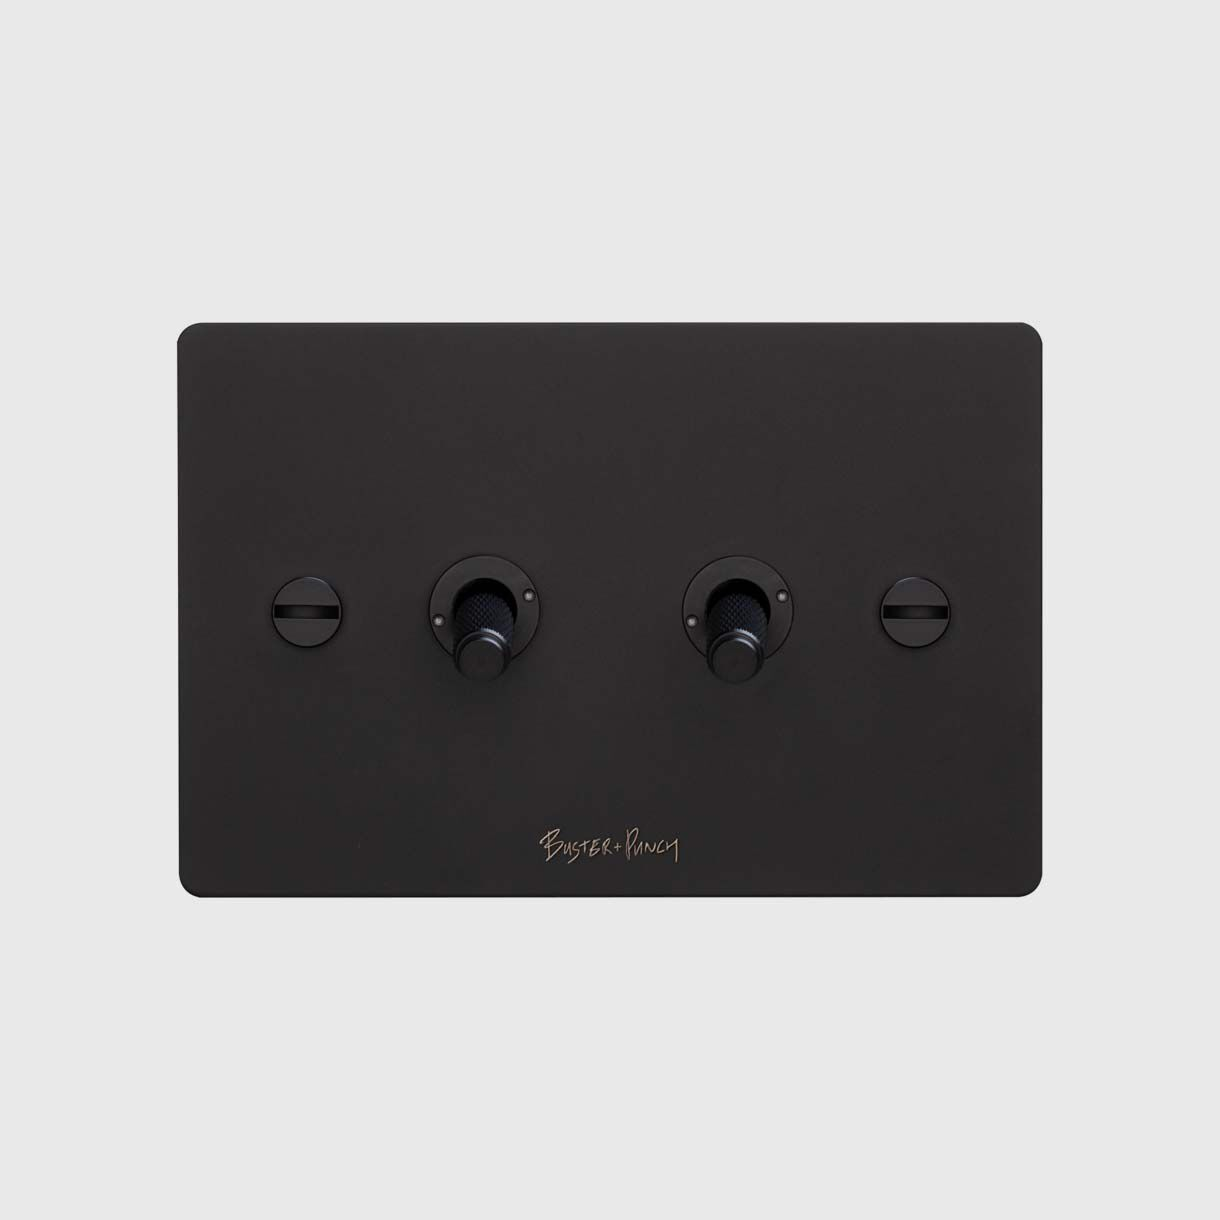 2G Toggle Switch